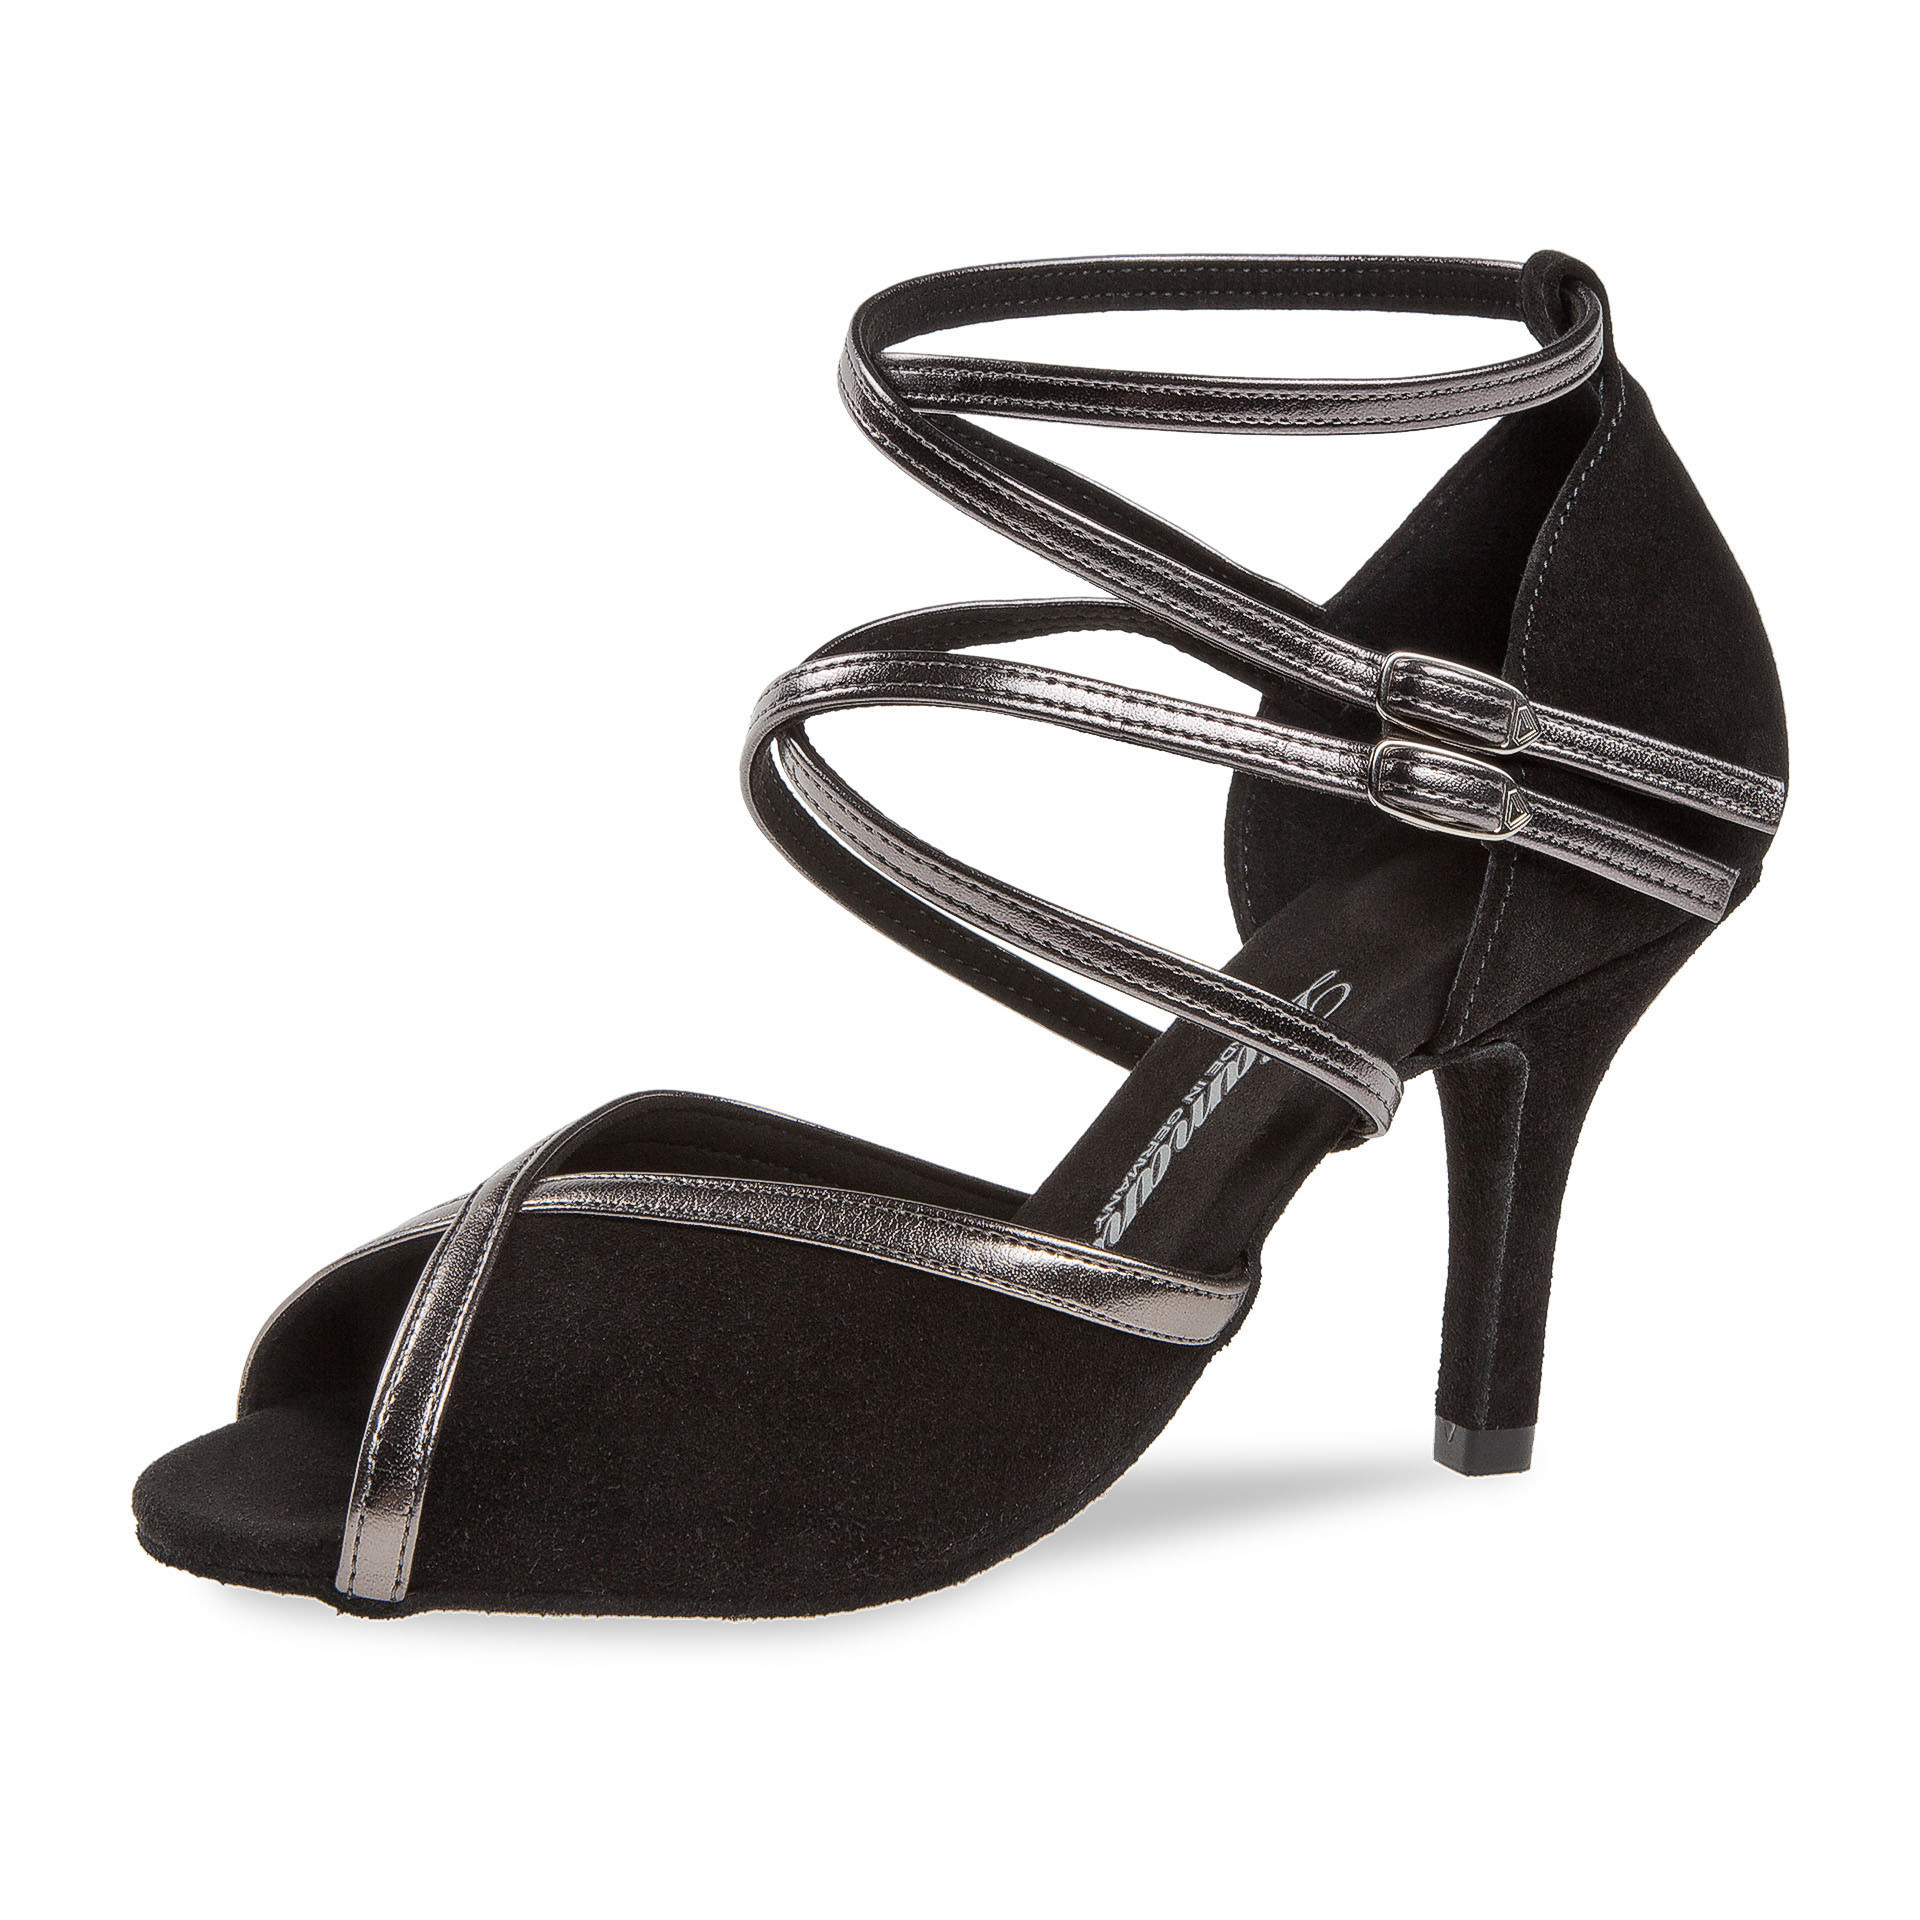 Diamant 178-058-501-Ballroom Shoes 3'' Slim Suede Sole-BLACK SUEDE / BRONZE SYNTH.